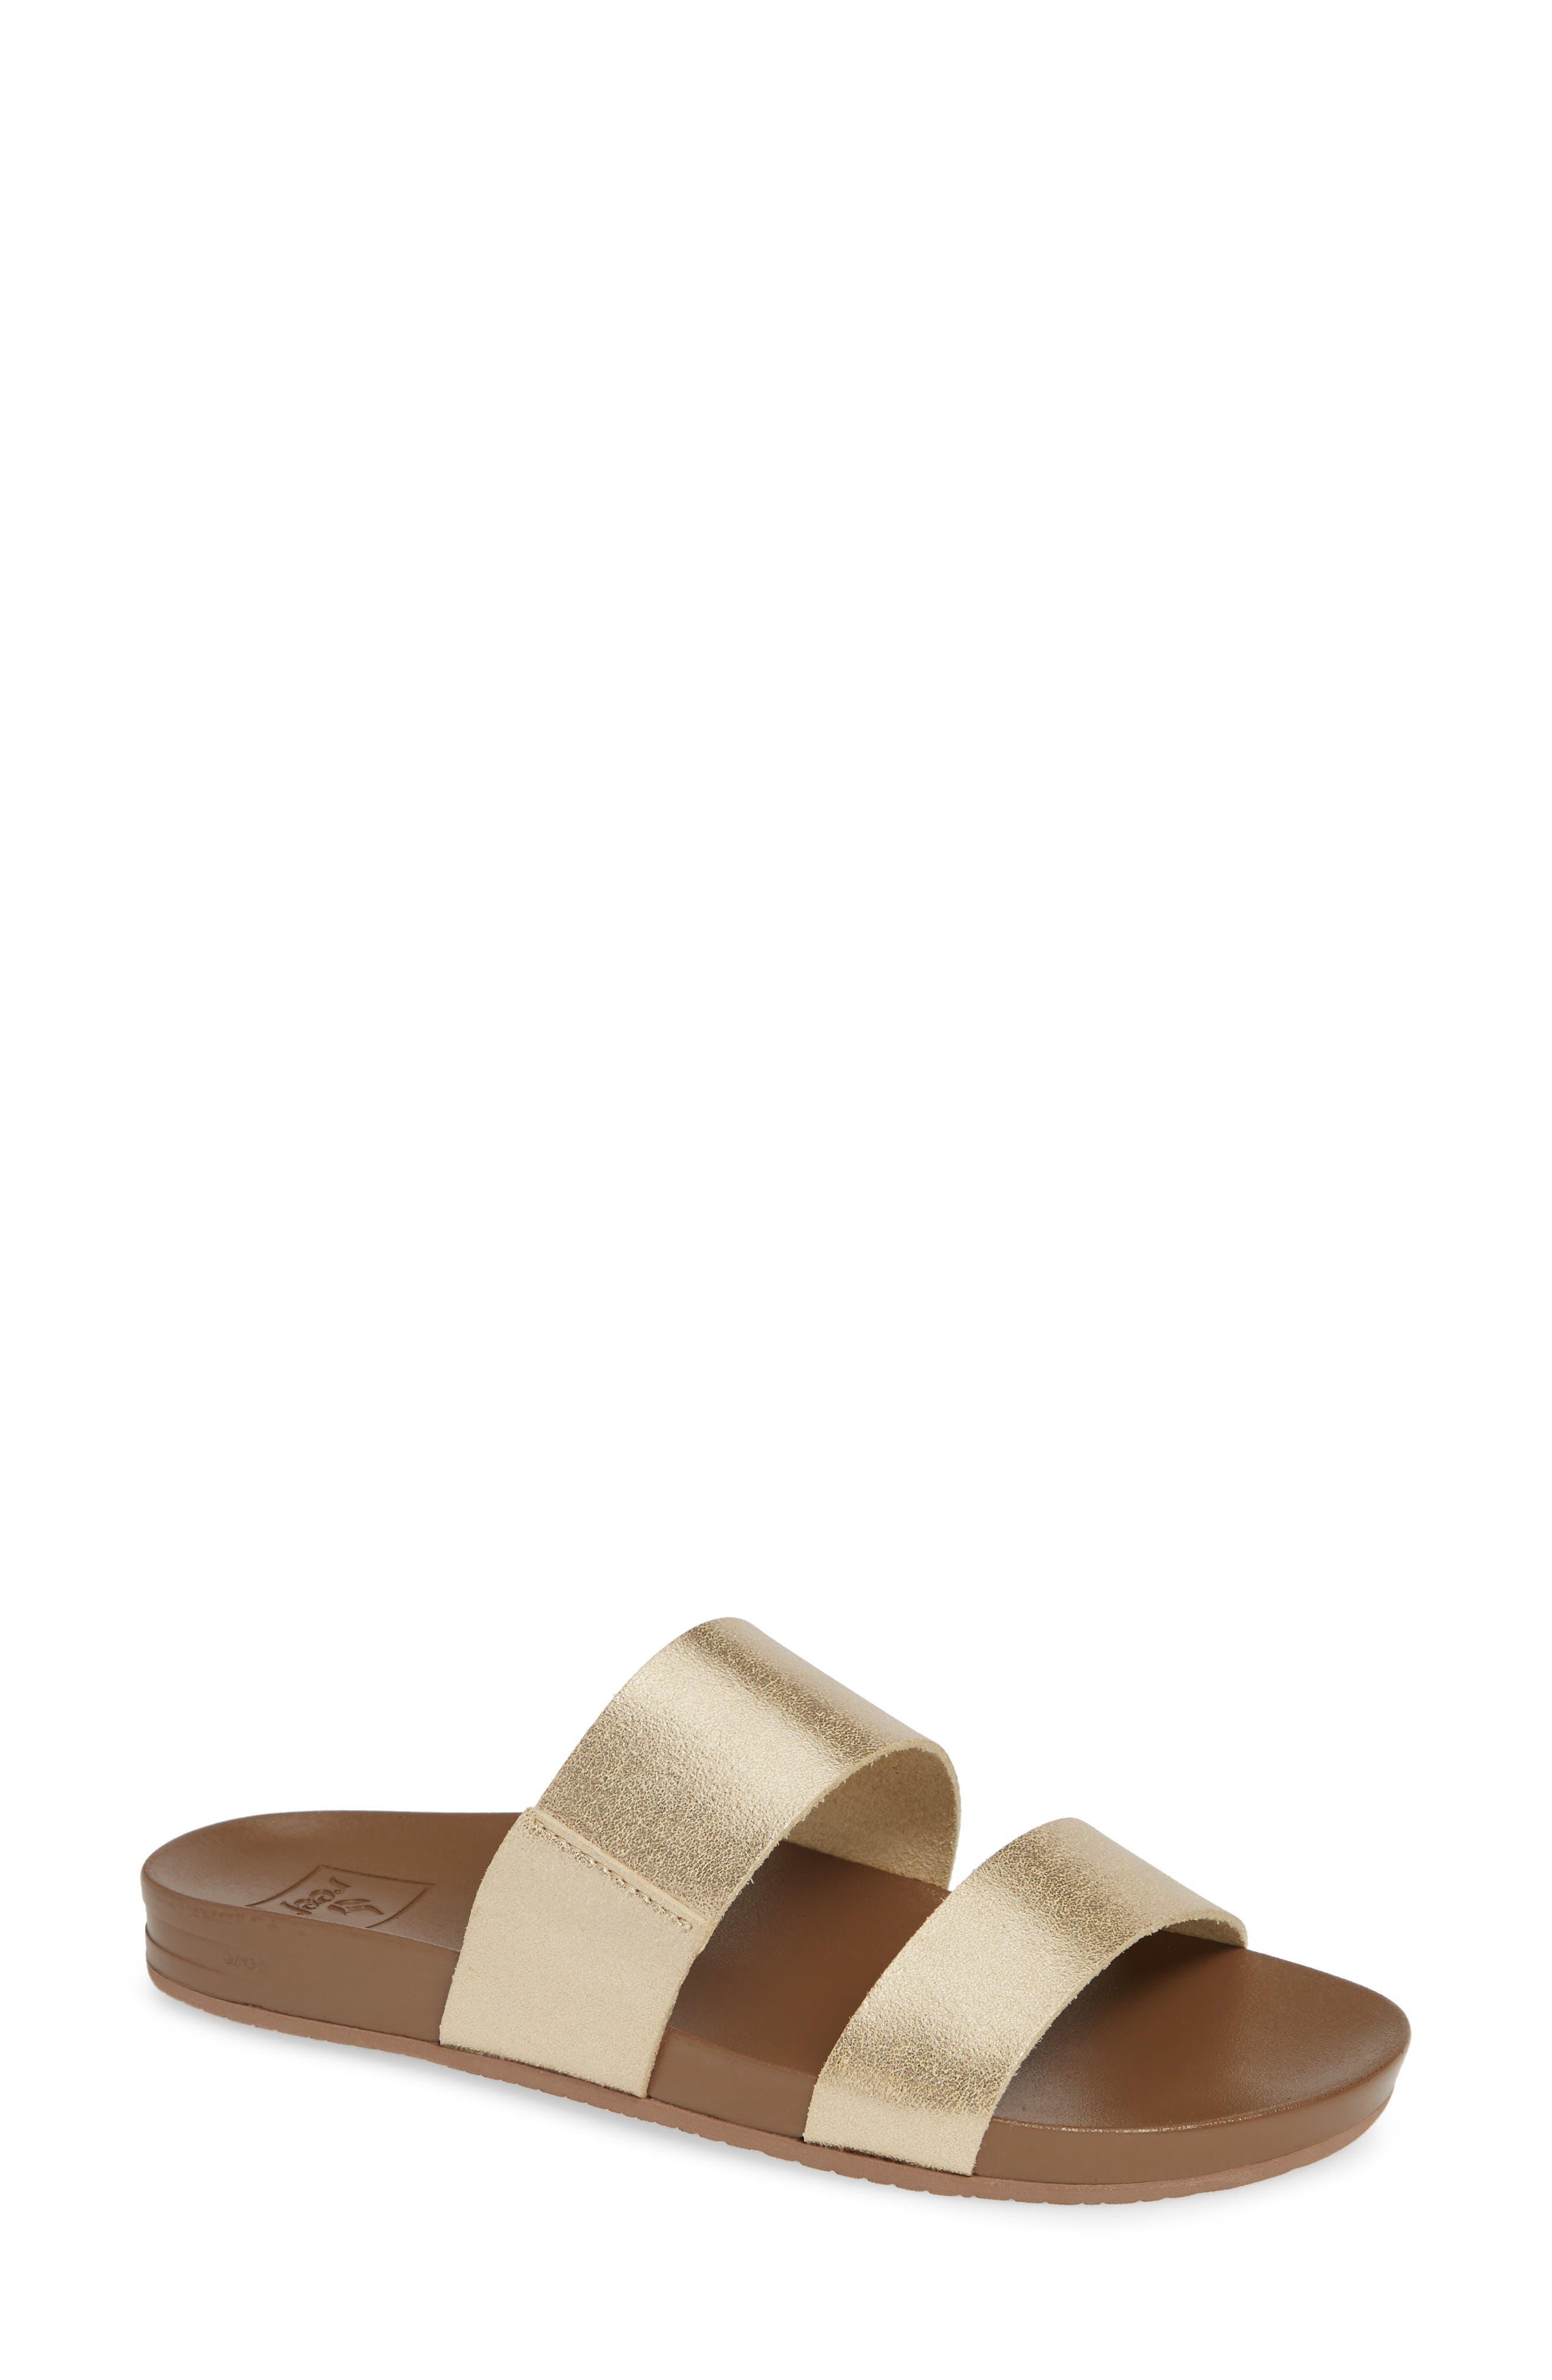 REEF Cushion Bounce Vista Slide Sandal, Main, color, 710